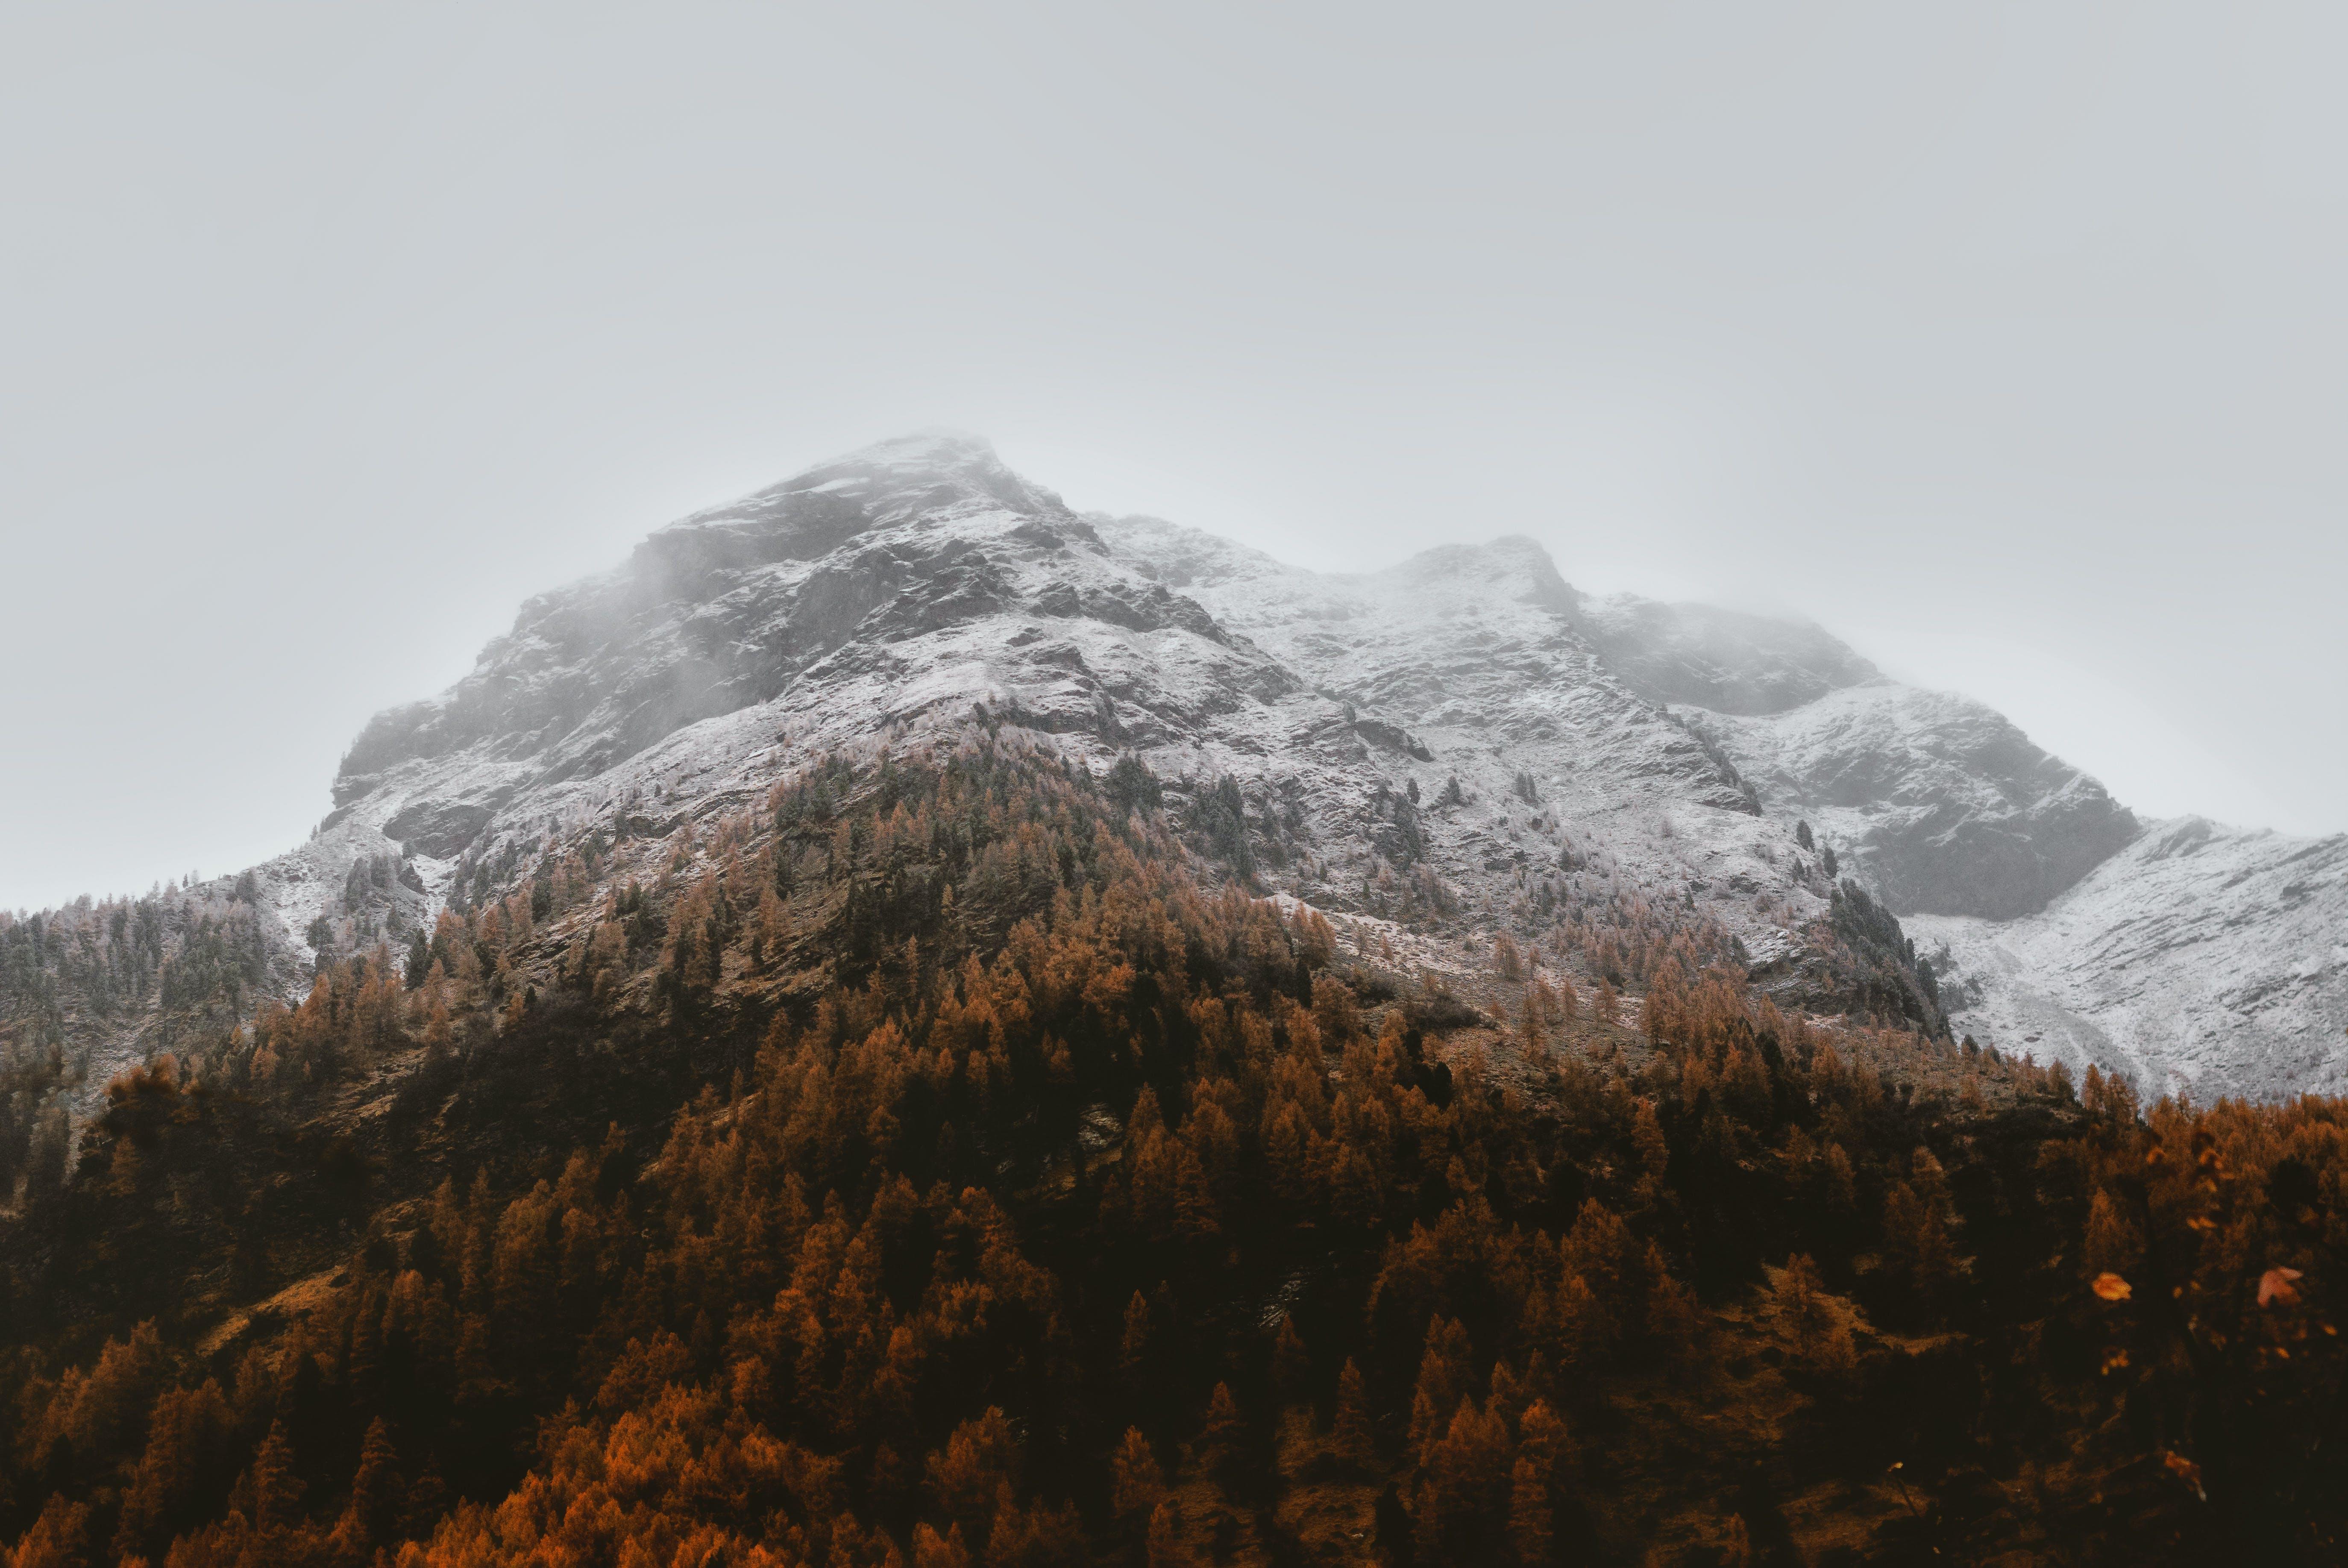 Kostenloses Stock Foto zu bäume, berg, dunstig, hd wallpaper